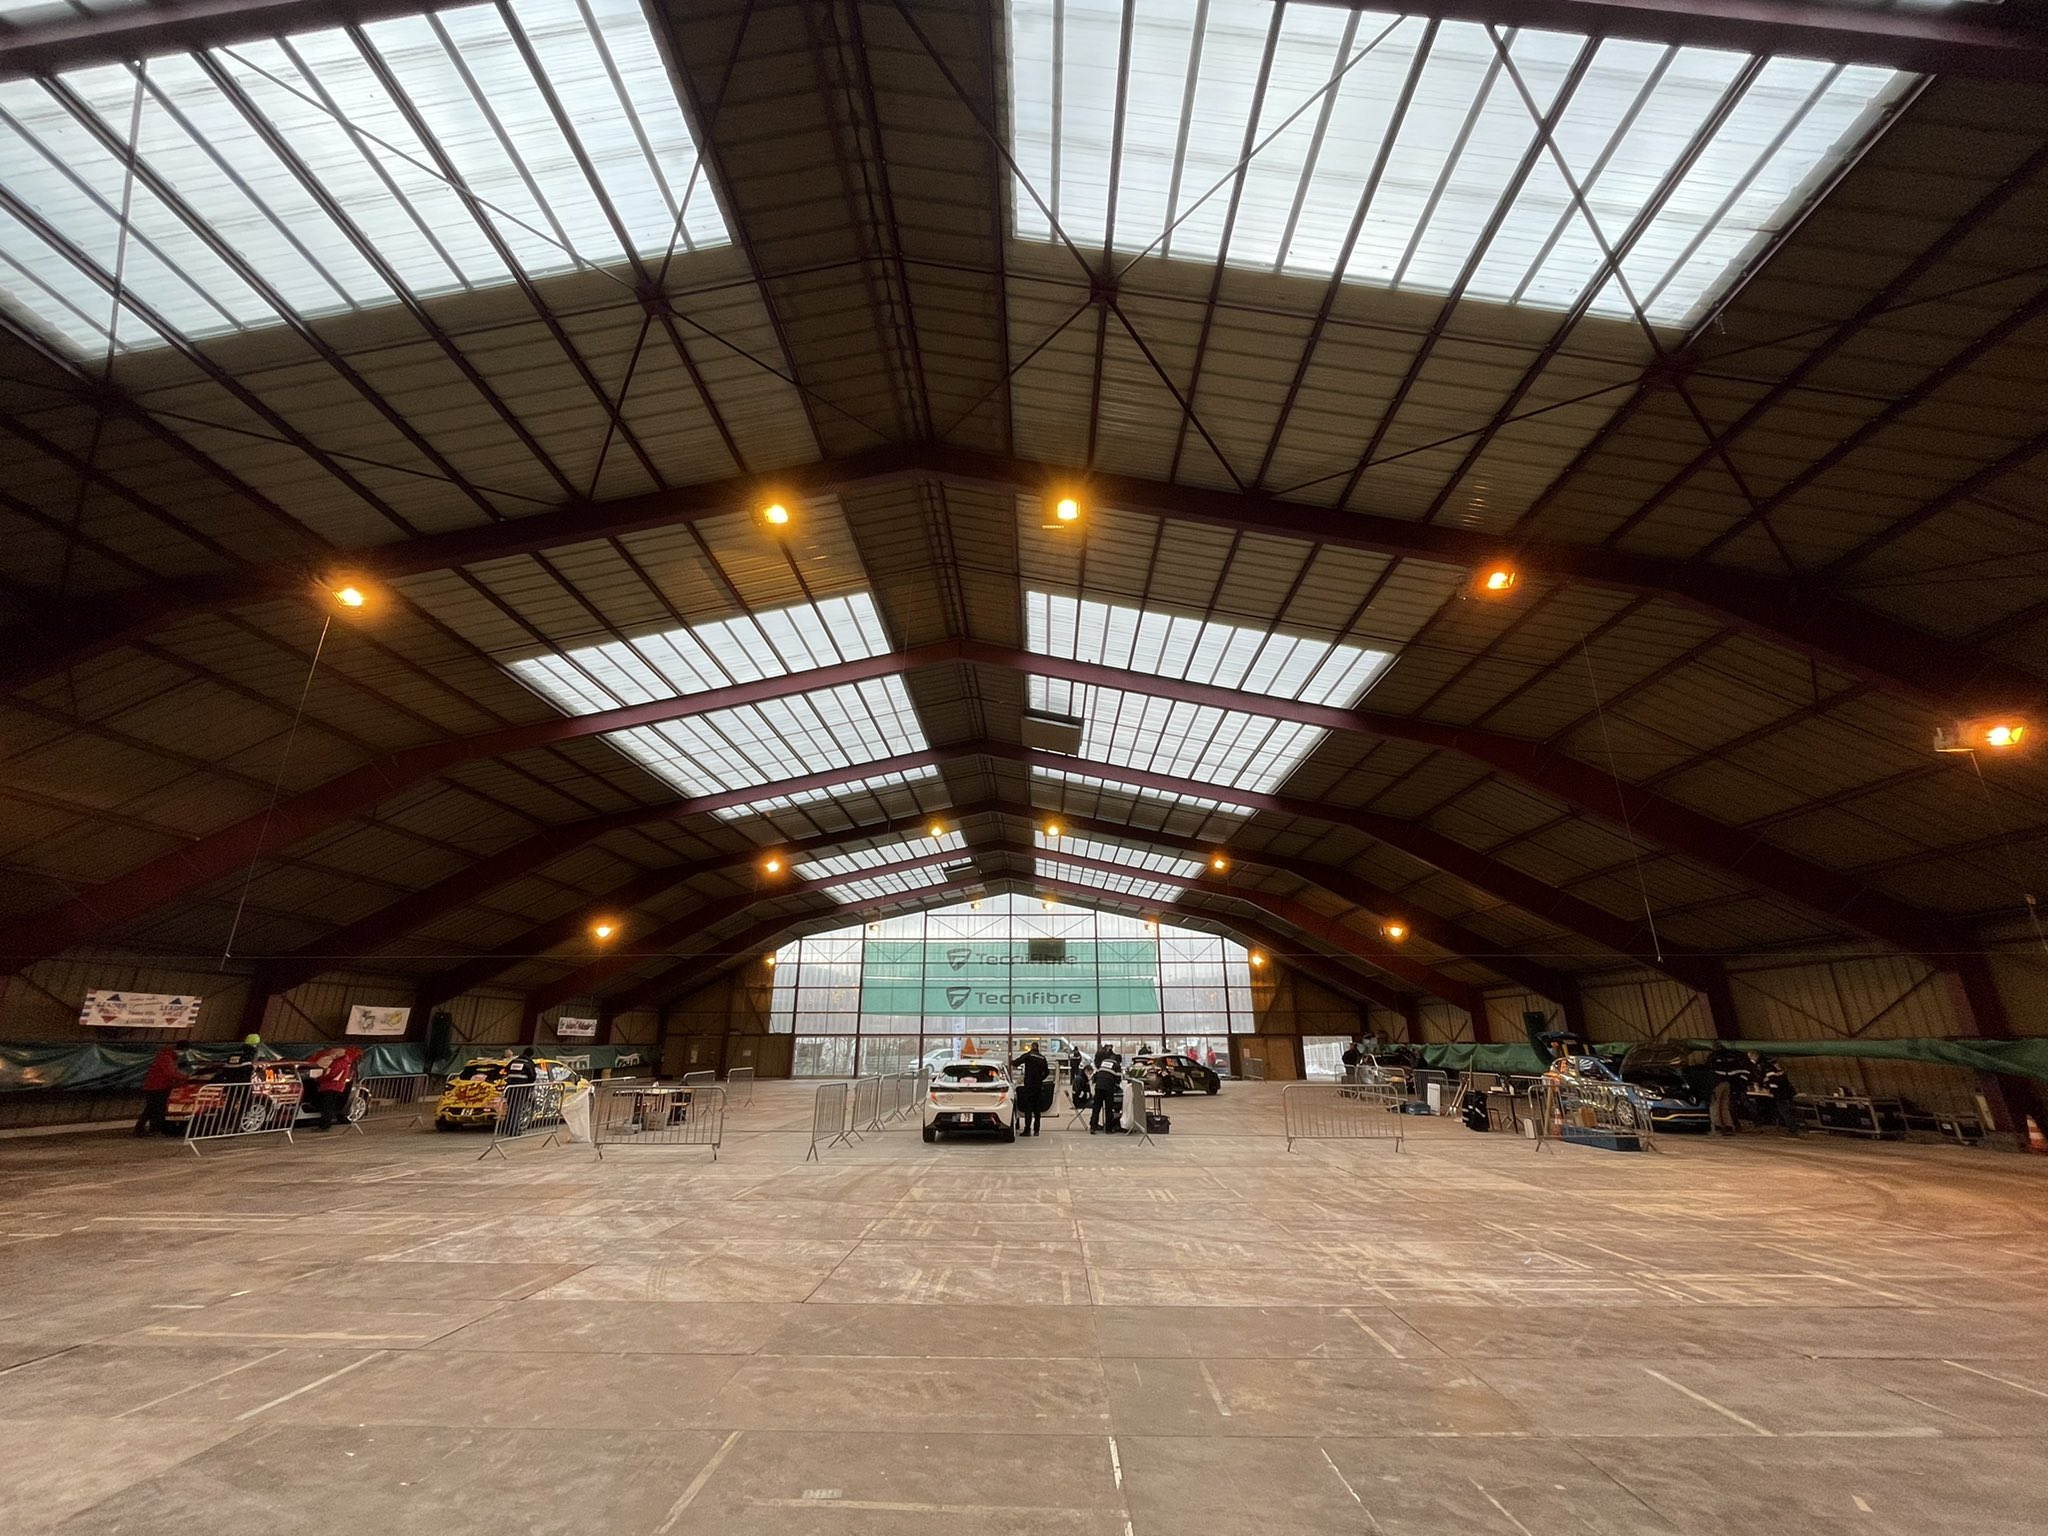 WRC: 89º Rallye Automobile de Monte-Carlo [18-24 Enero] - Página 3 EsL0ZOvXIAAwQdl?format=jpg&name=large